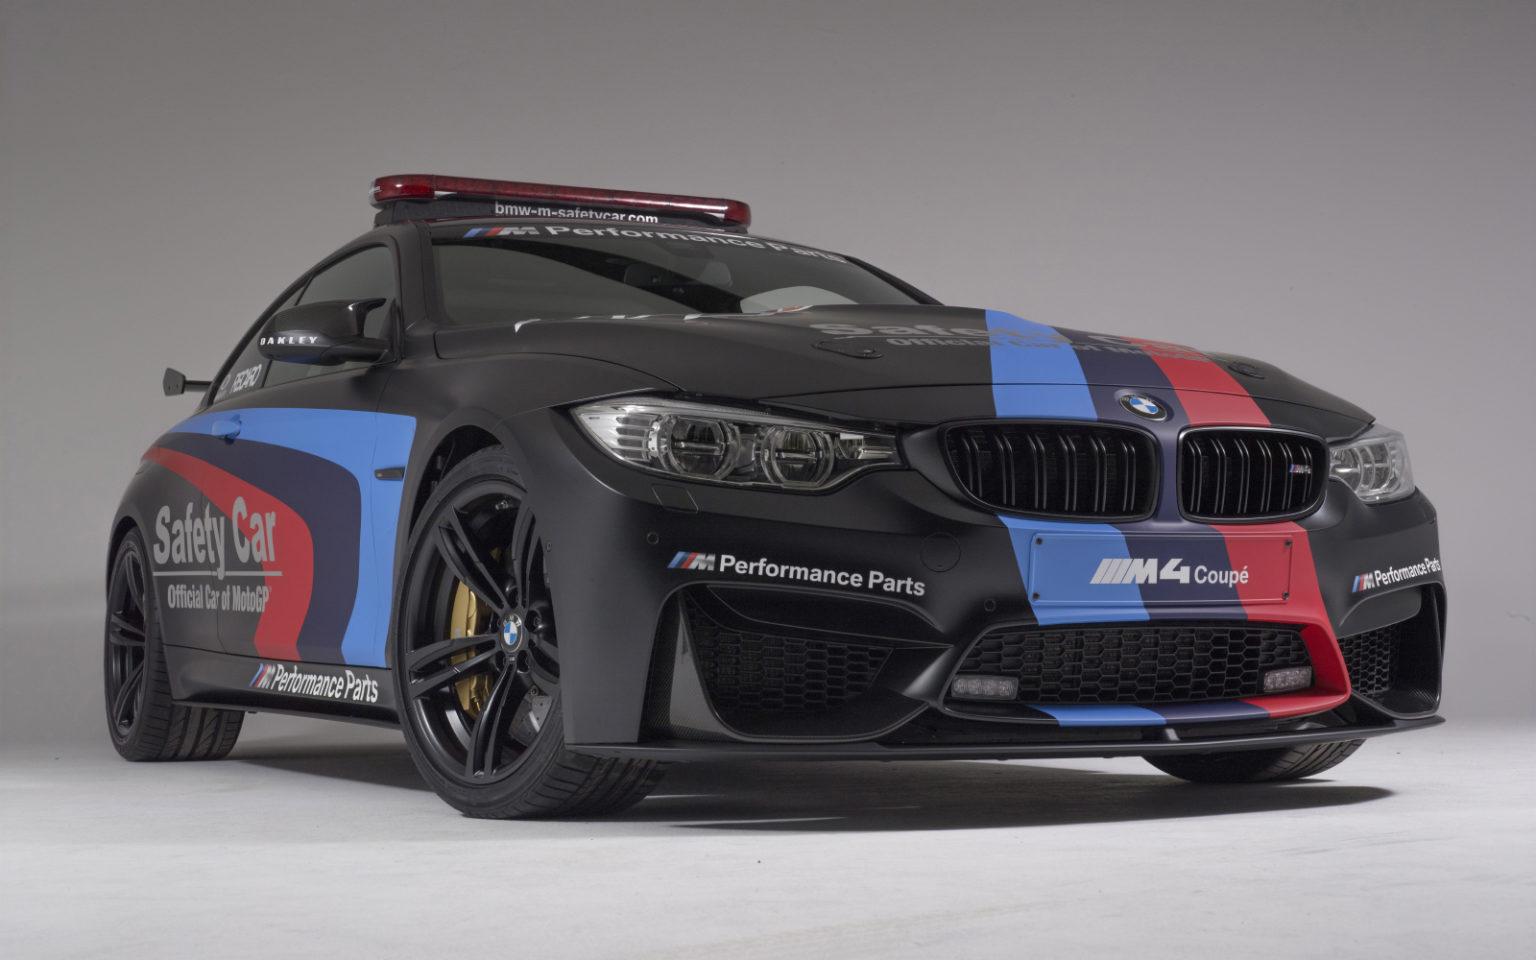 BMW_M4_SafetyCar_2015_schwarz_57_GB_ohne_Reflex_1v-1